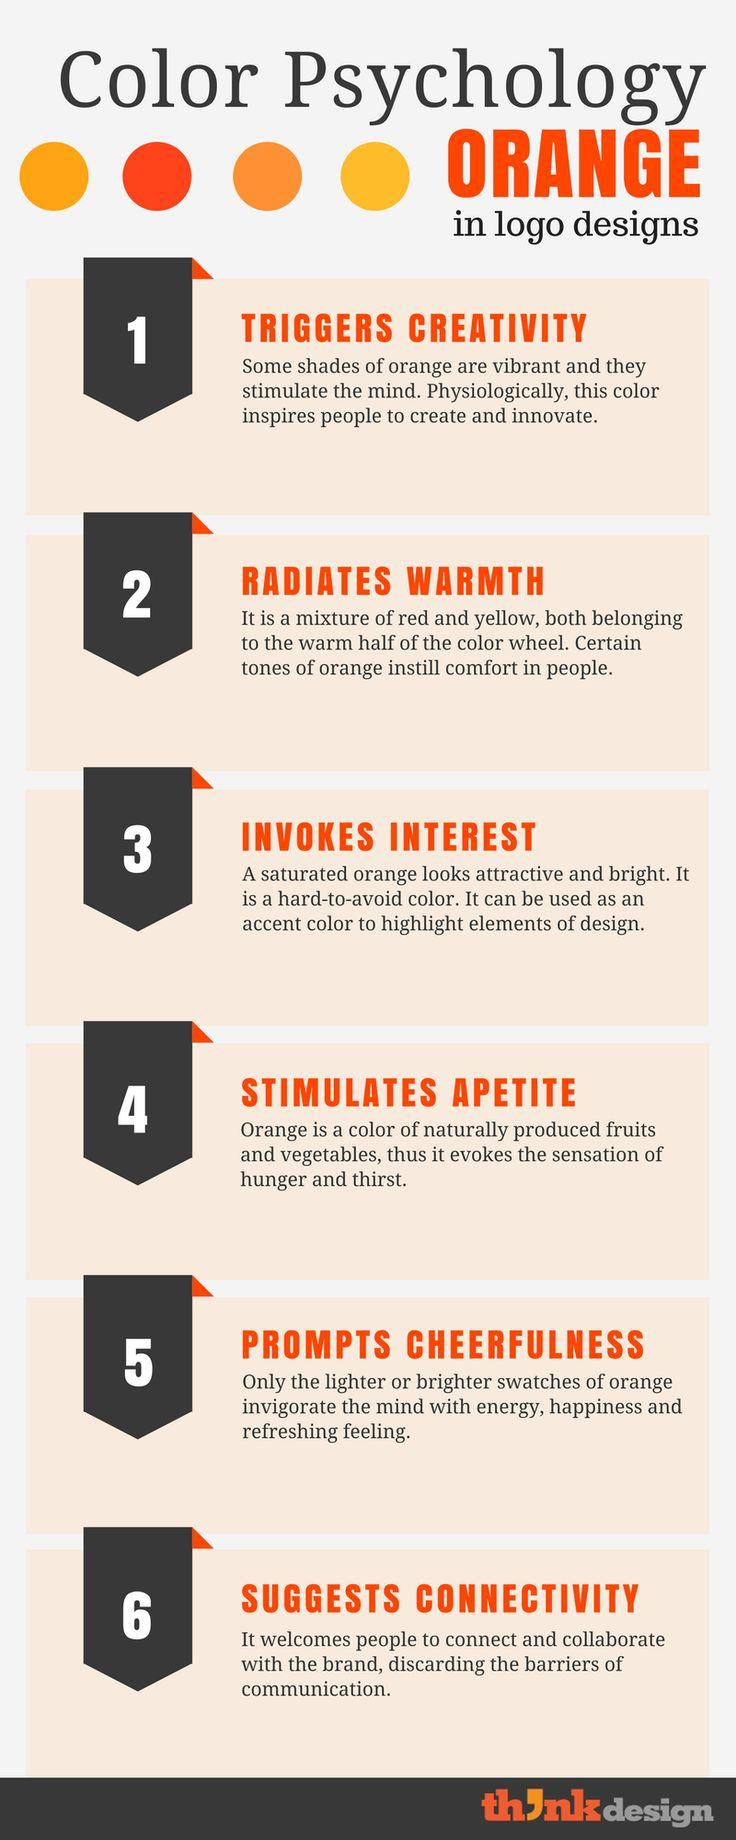 Psychology-Infographic-Color-Psychology-Of-Orange-Logos-Guide-For-Branding-Noobs-–-Think-Design-Sp Psychology Infographic : Color Psychology Of Orange Logos: Guide For Branding Noobs – Think Design | Sp...